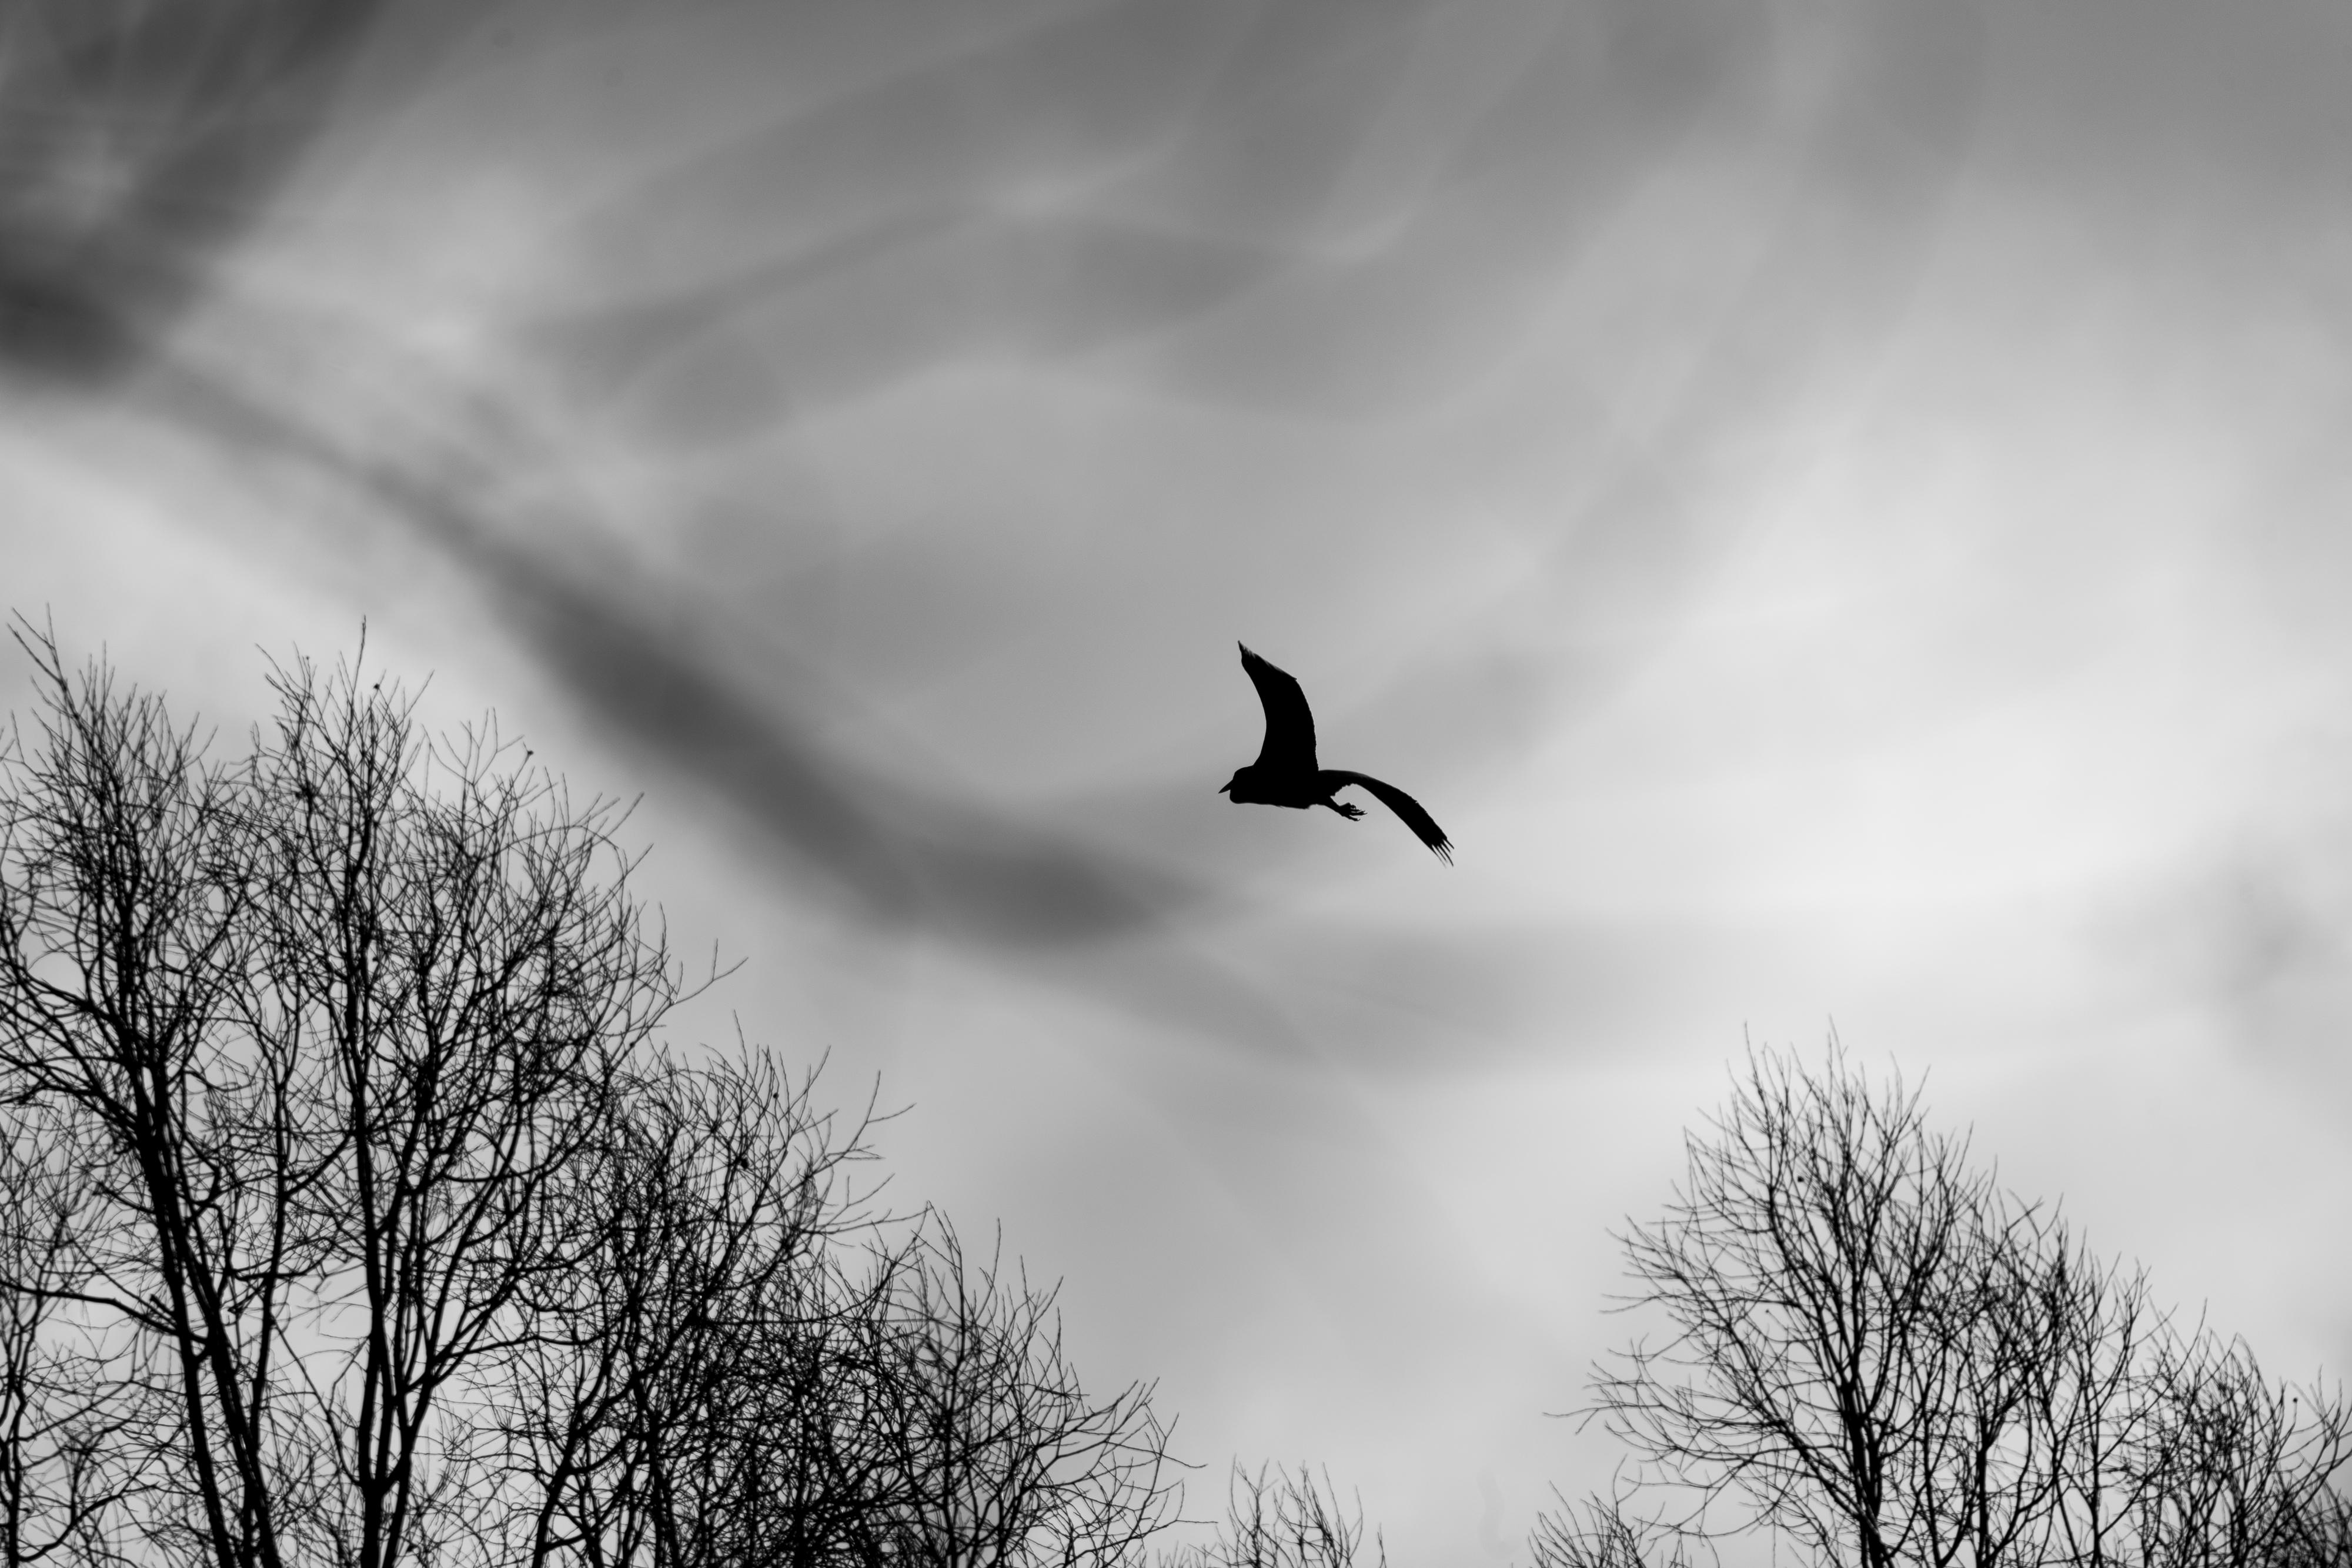 Into Weirder Skies! by Mincingyoda